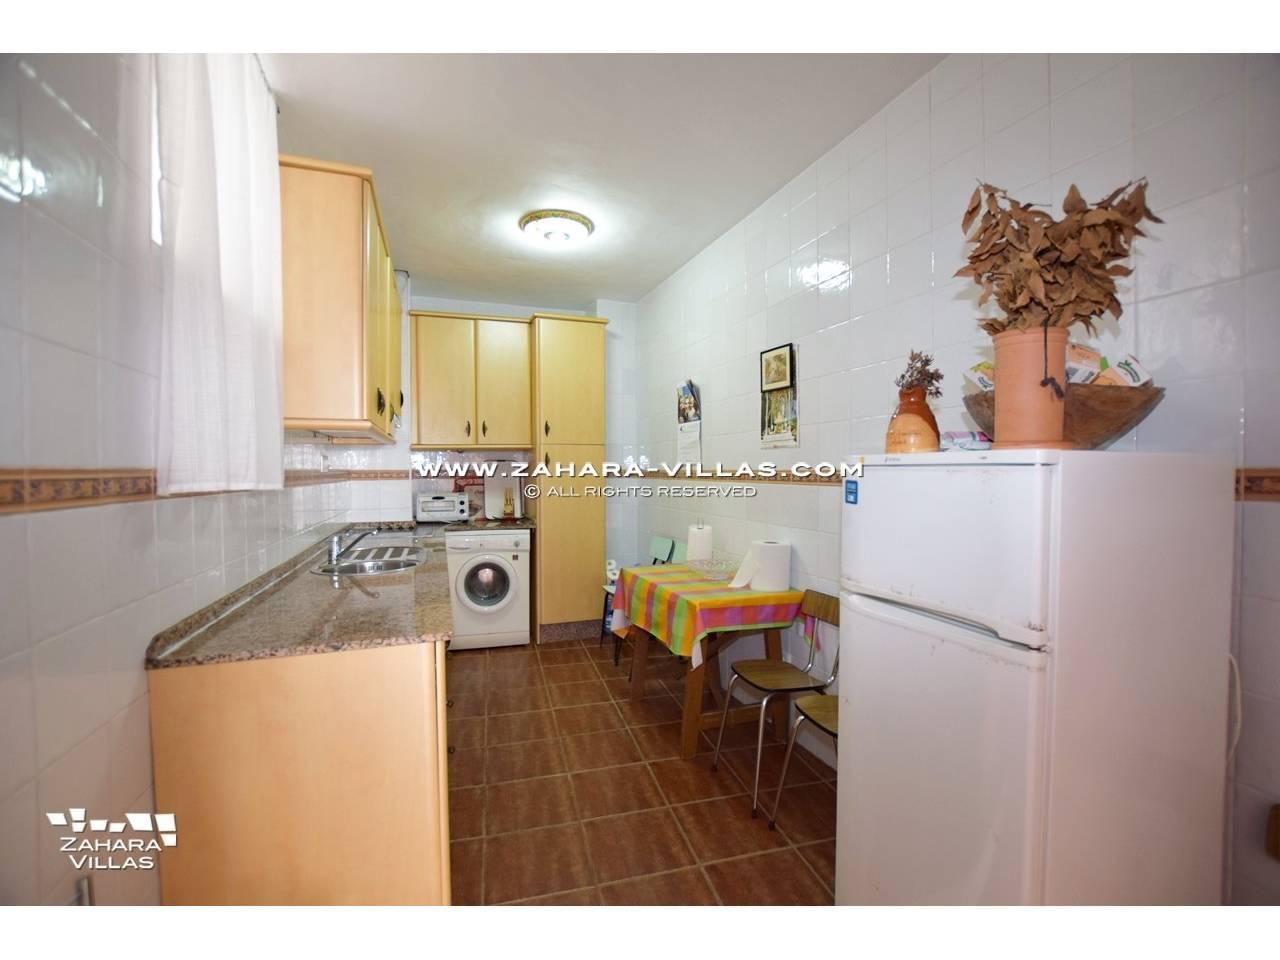 Imagen 17 de House, Apartment and Plot to build in the historic center of Vejer de la Frontera